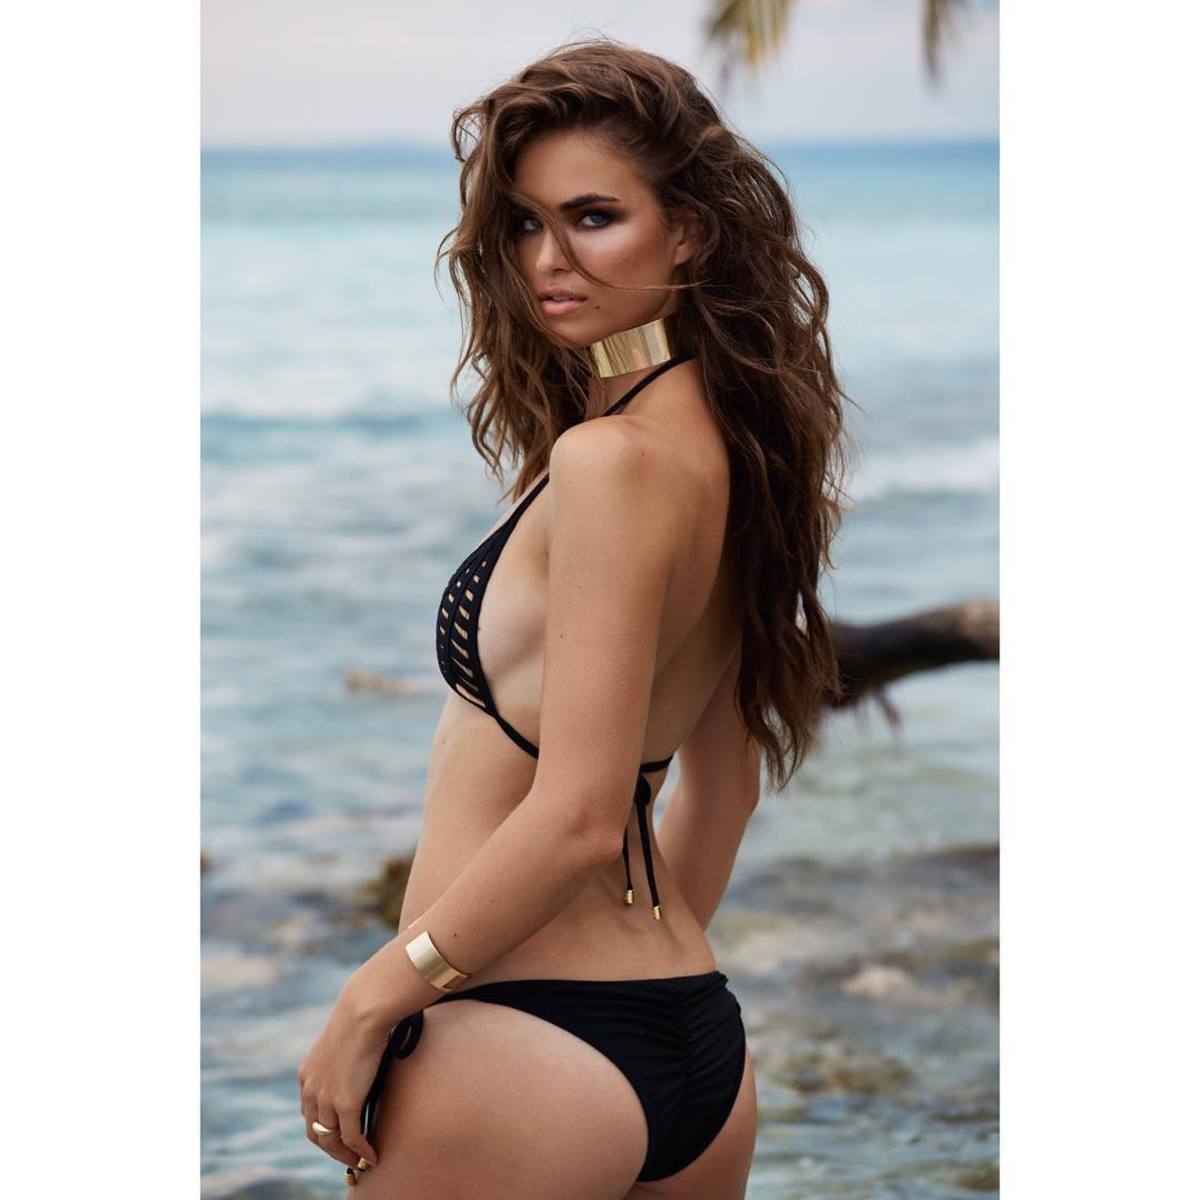 Robin-Marjolein-instagram-5.jpg